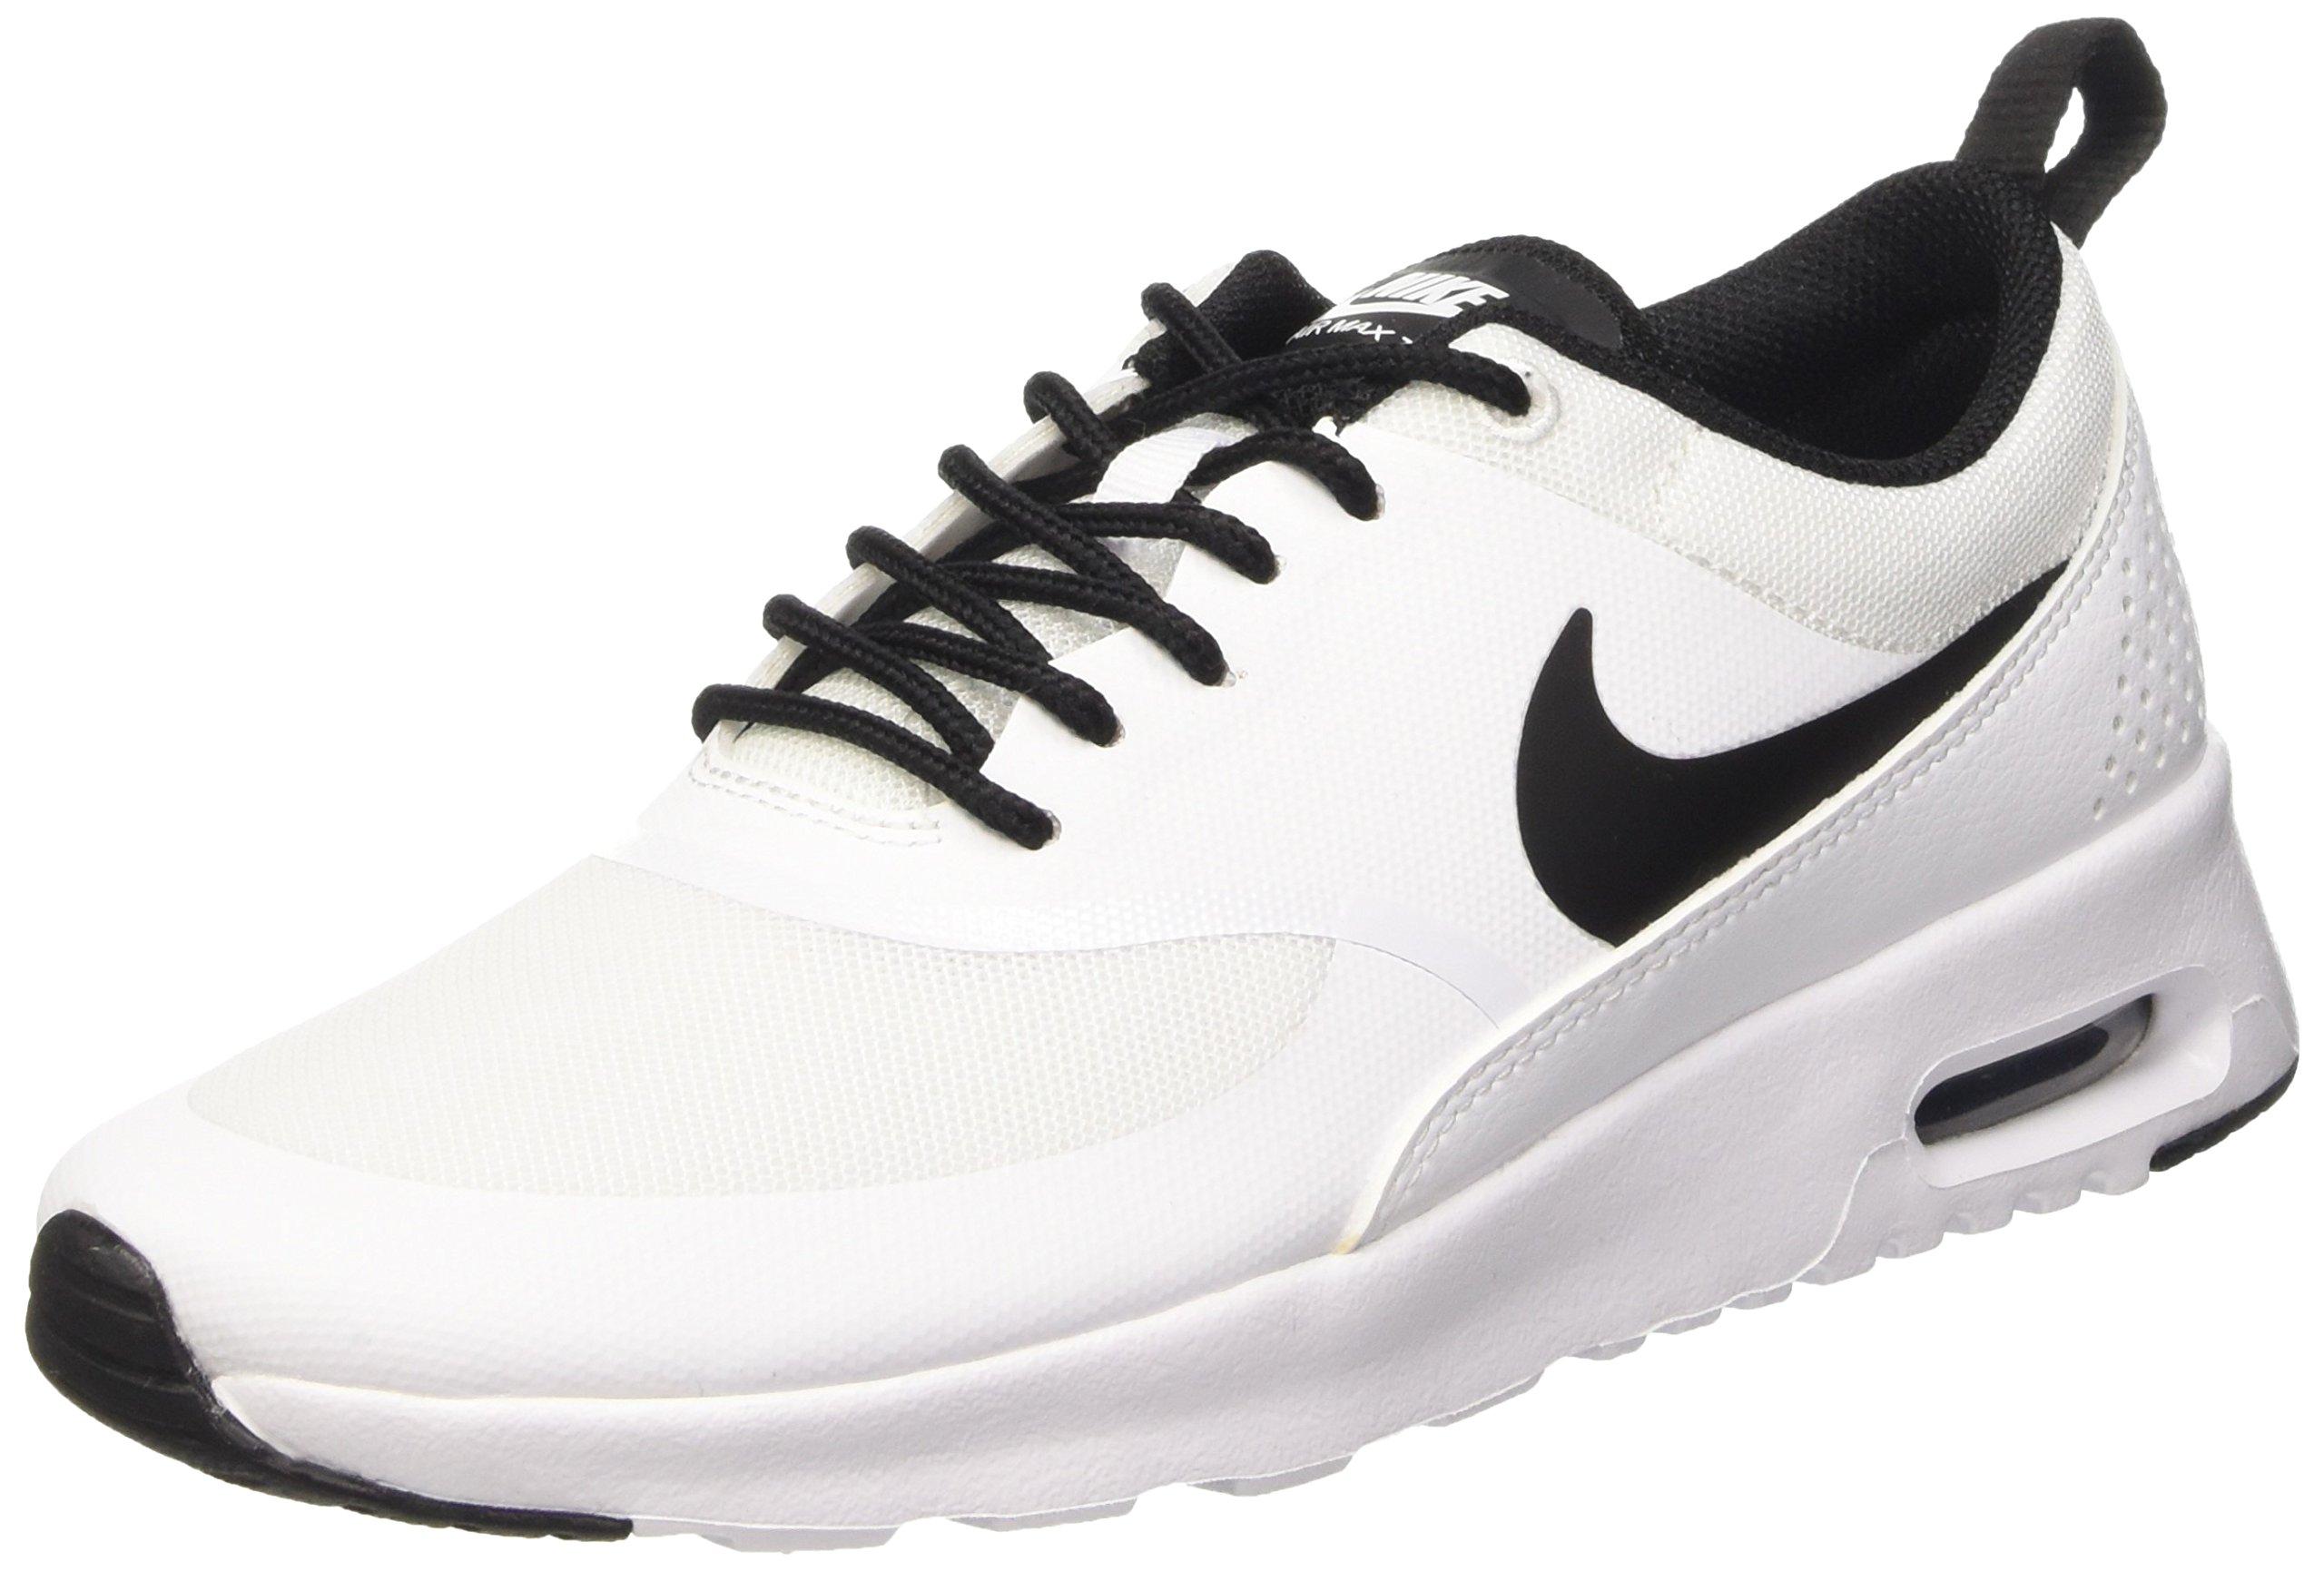 Nike Womens Air Max Thea White/Black/White Running Shoe 9 Women US